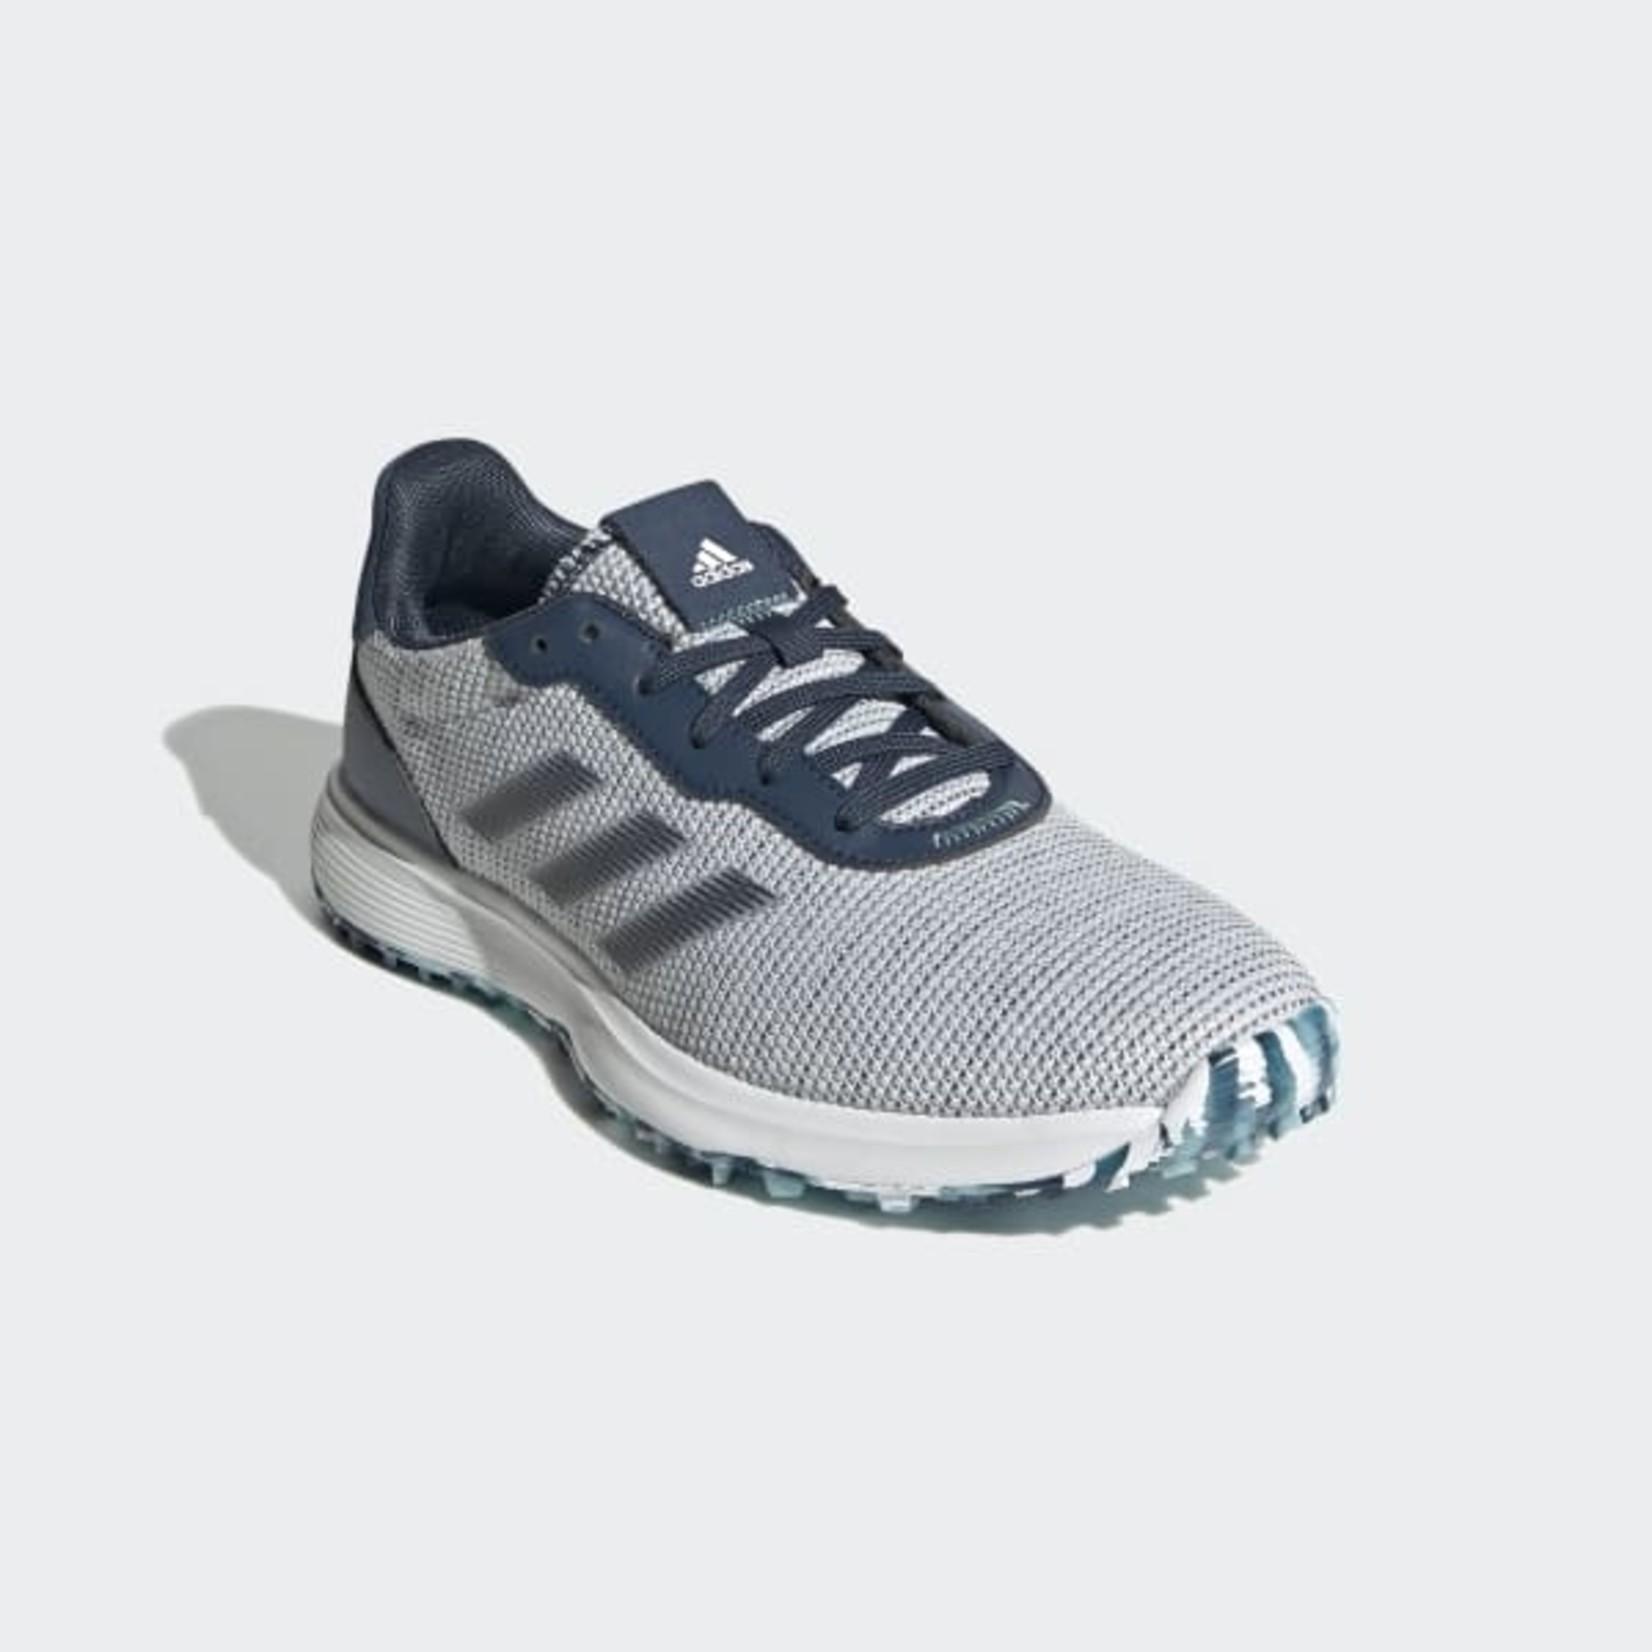 Adidas Adidas W S2G SL Navy UK 6 1/2 / EUR 40